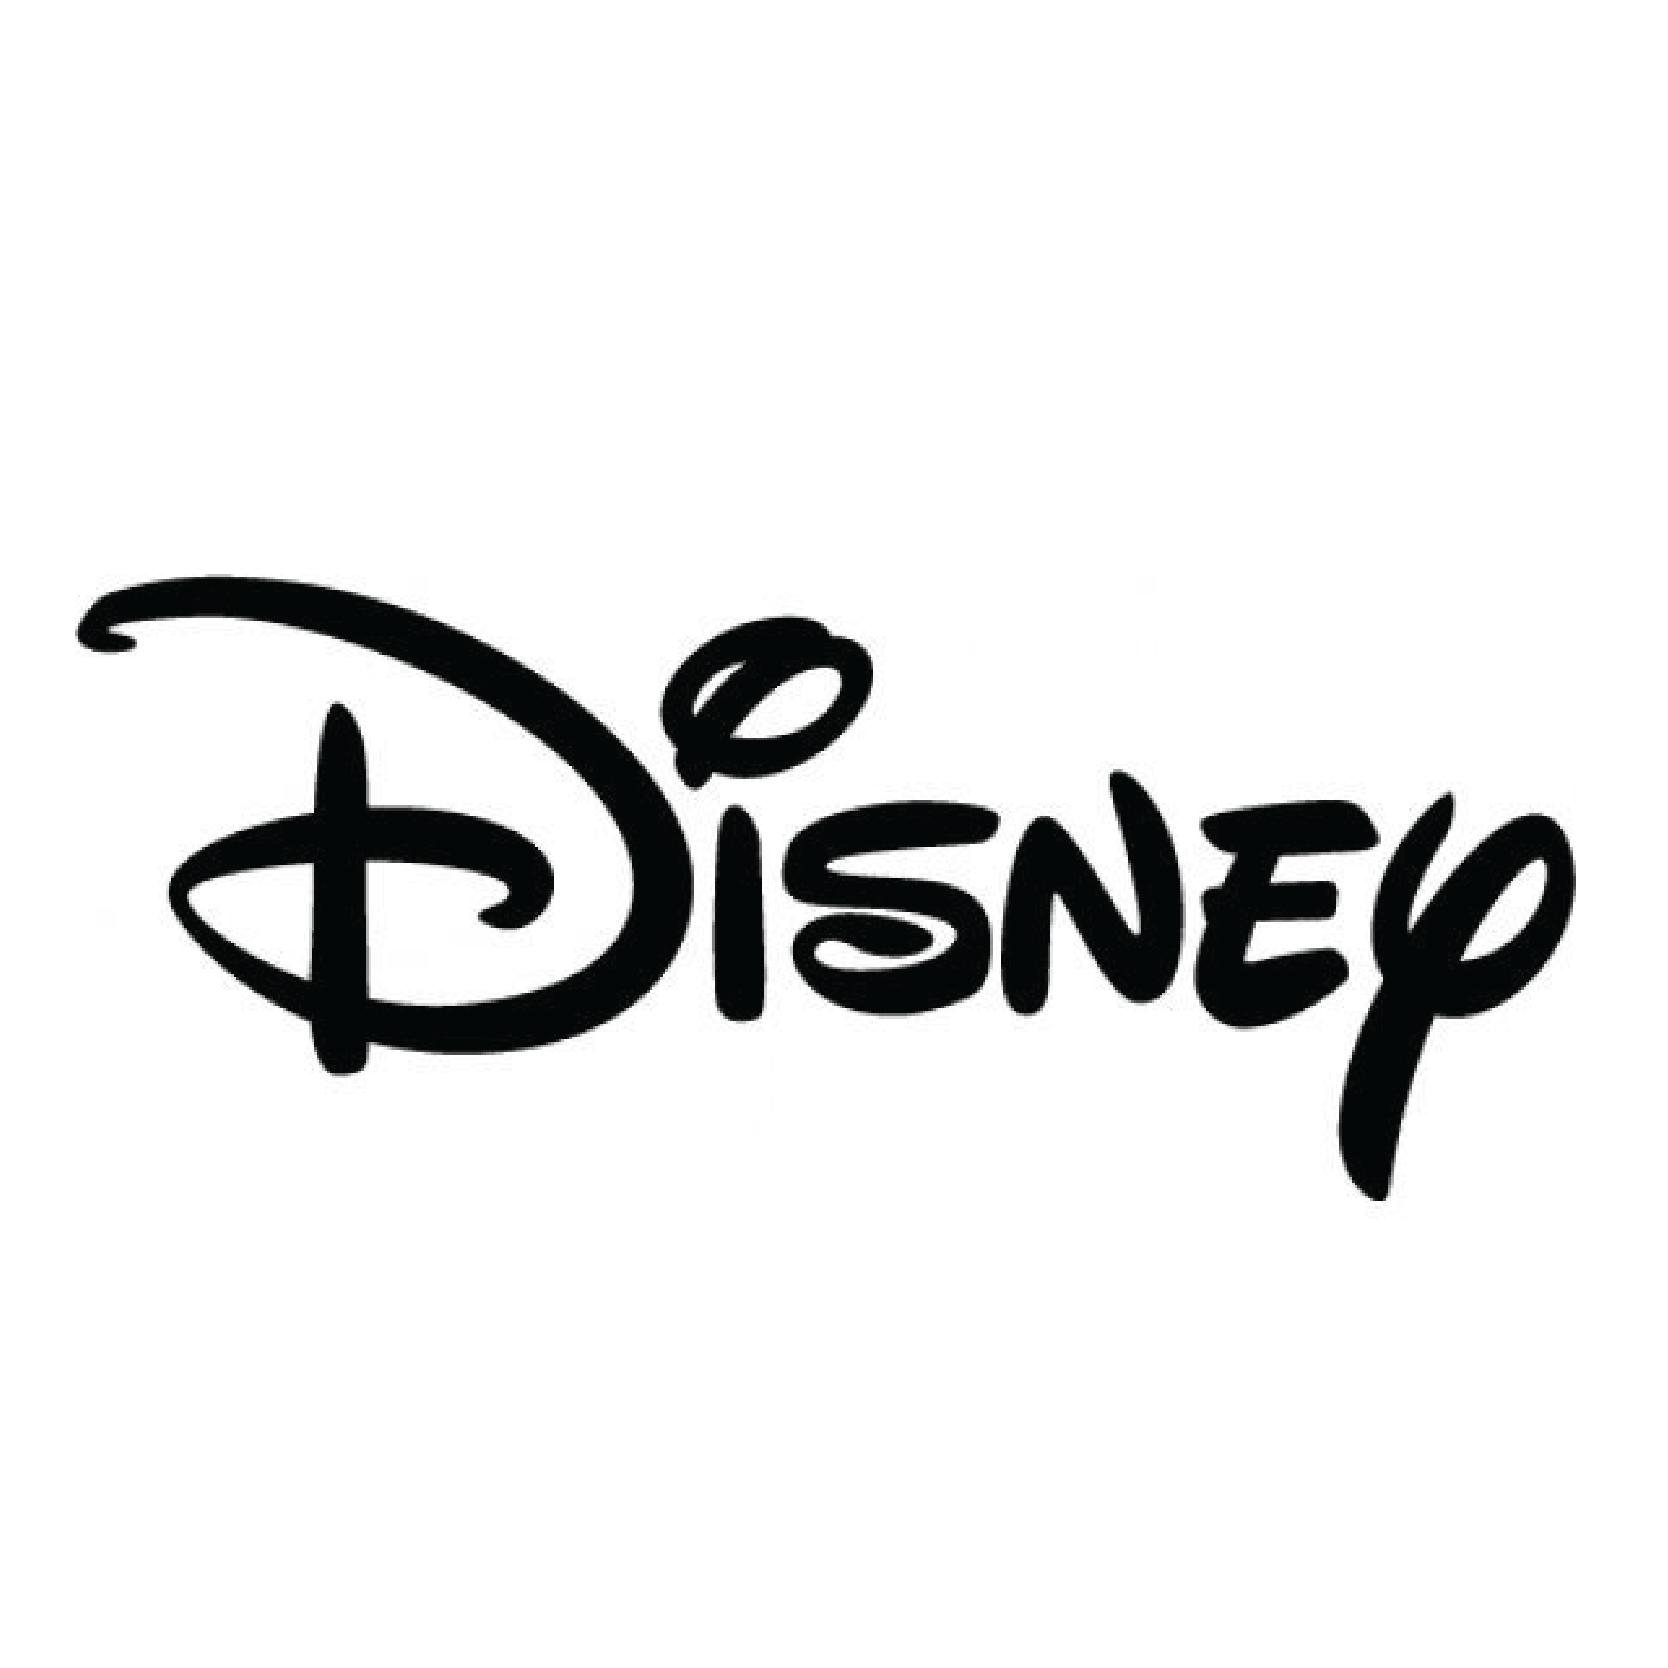 images_logo6_logo1 copy.png